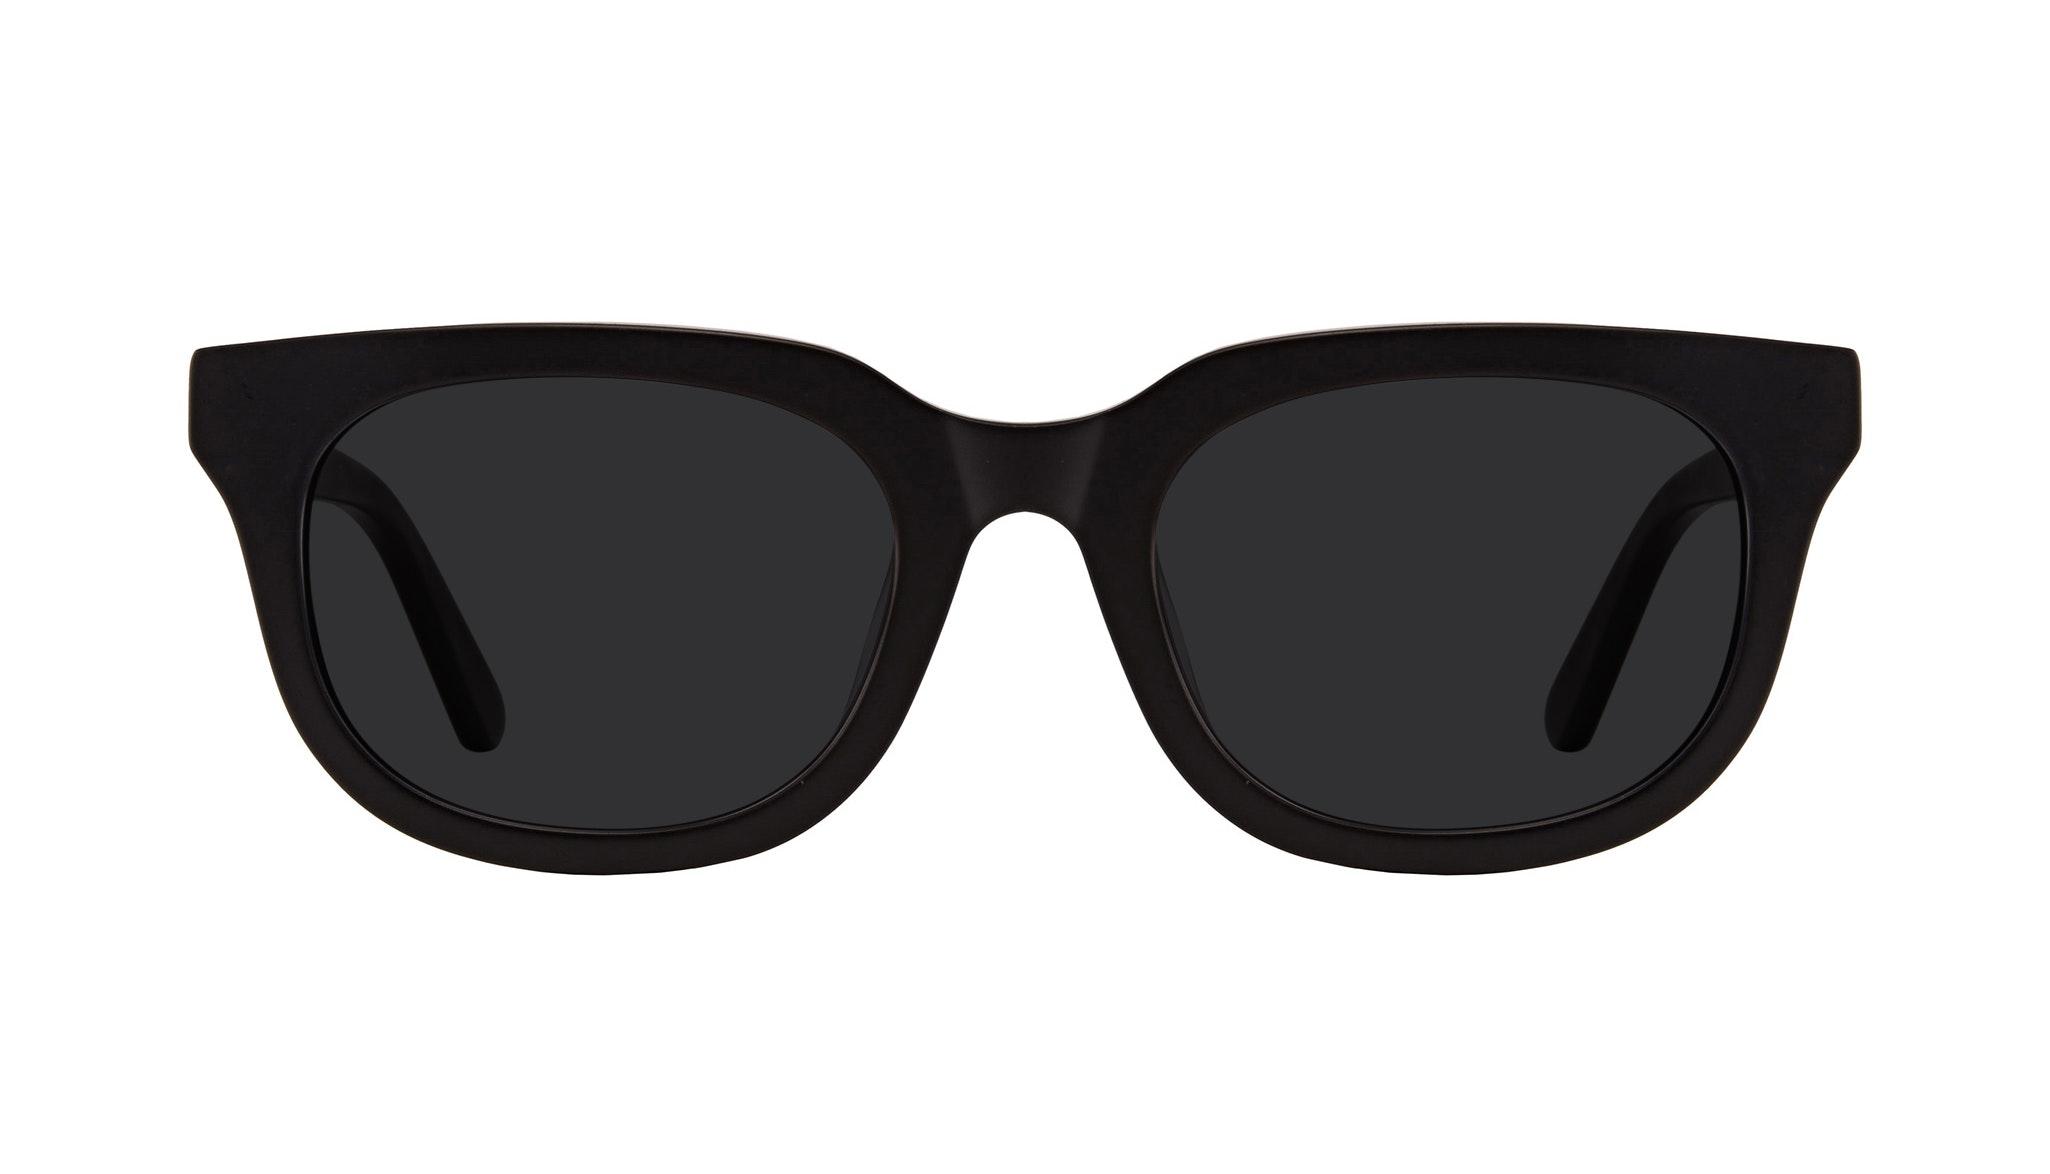 Affordable Fashion Glasses Square Sunglasses Men Stout Matte Black